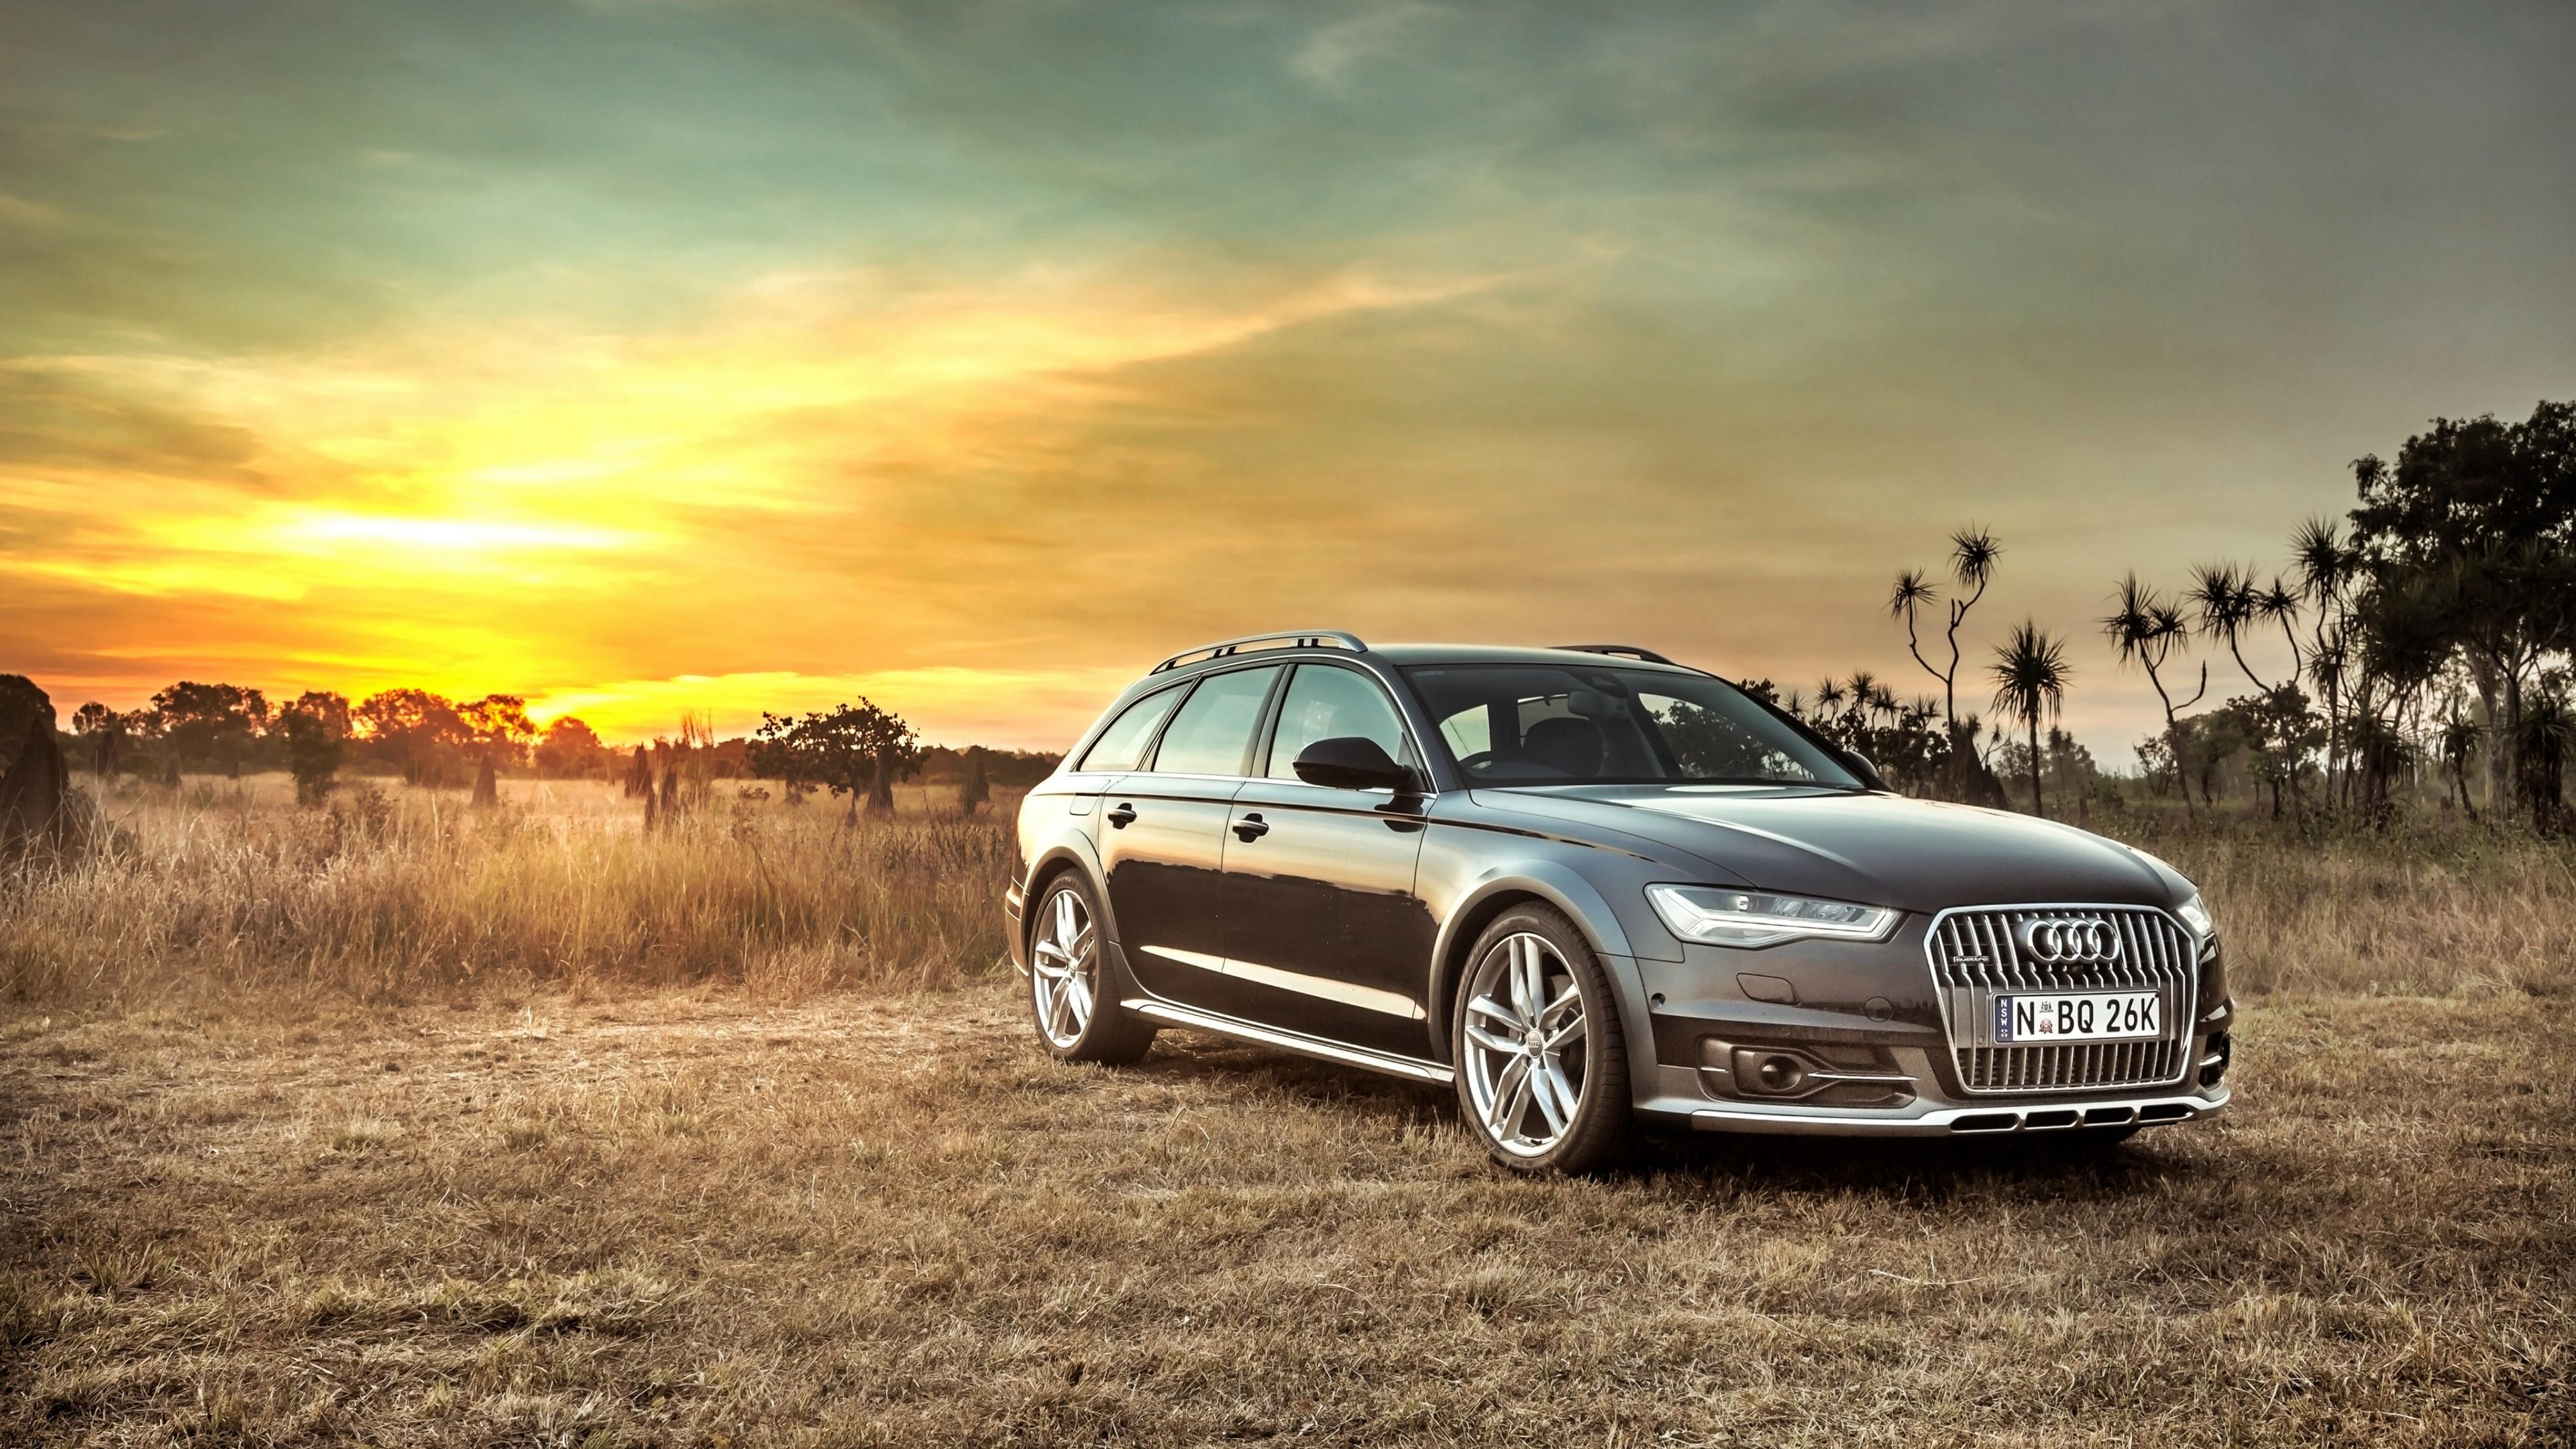 Wallpaper Audi A6 Allread at sunset